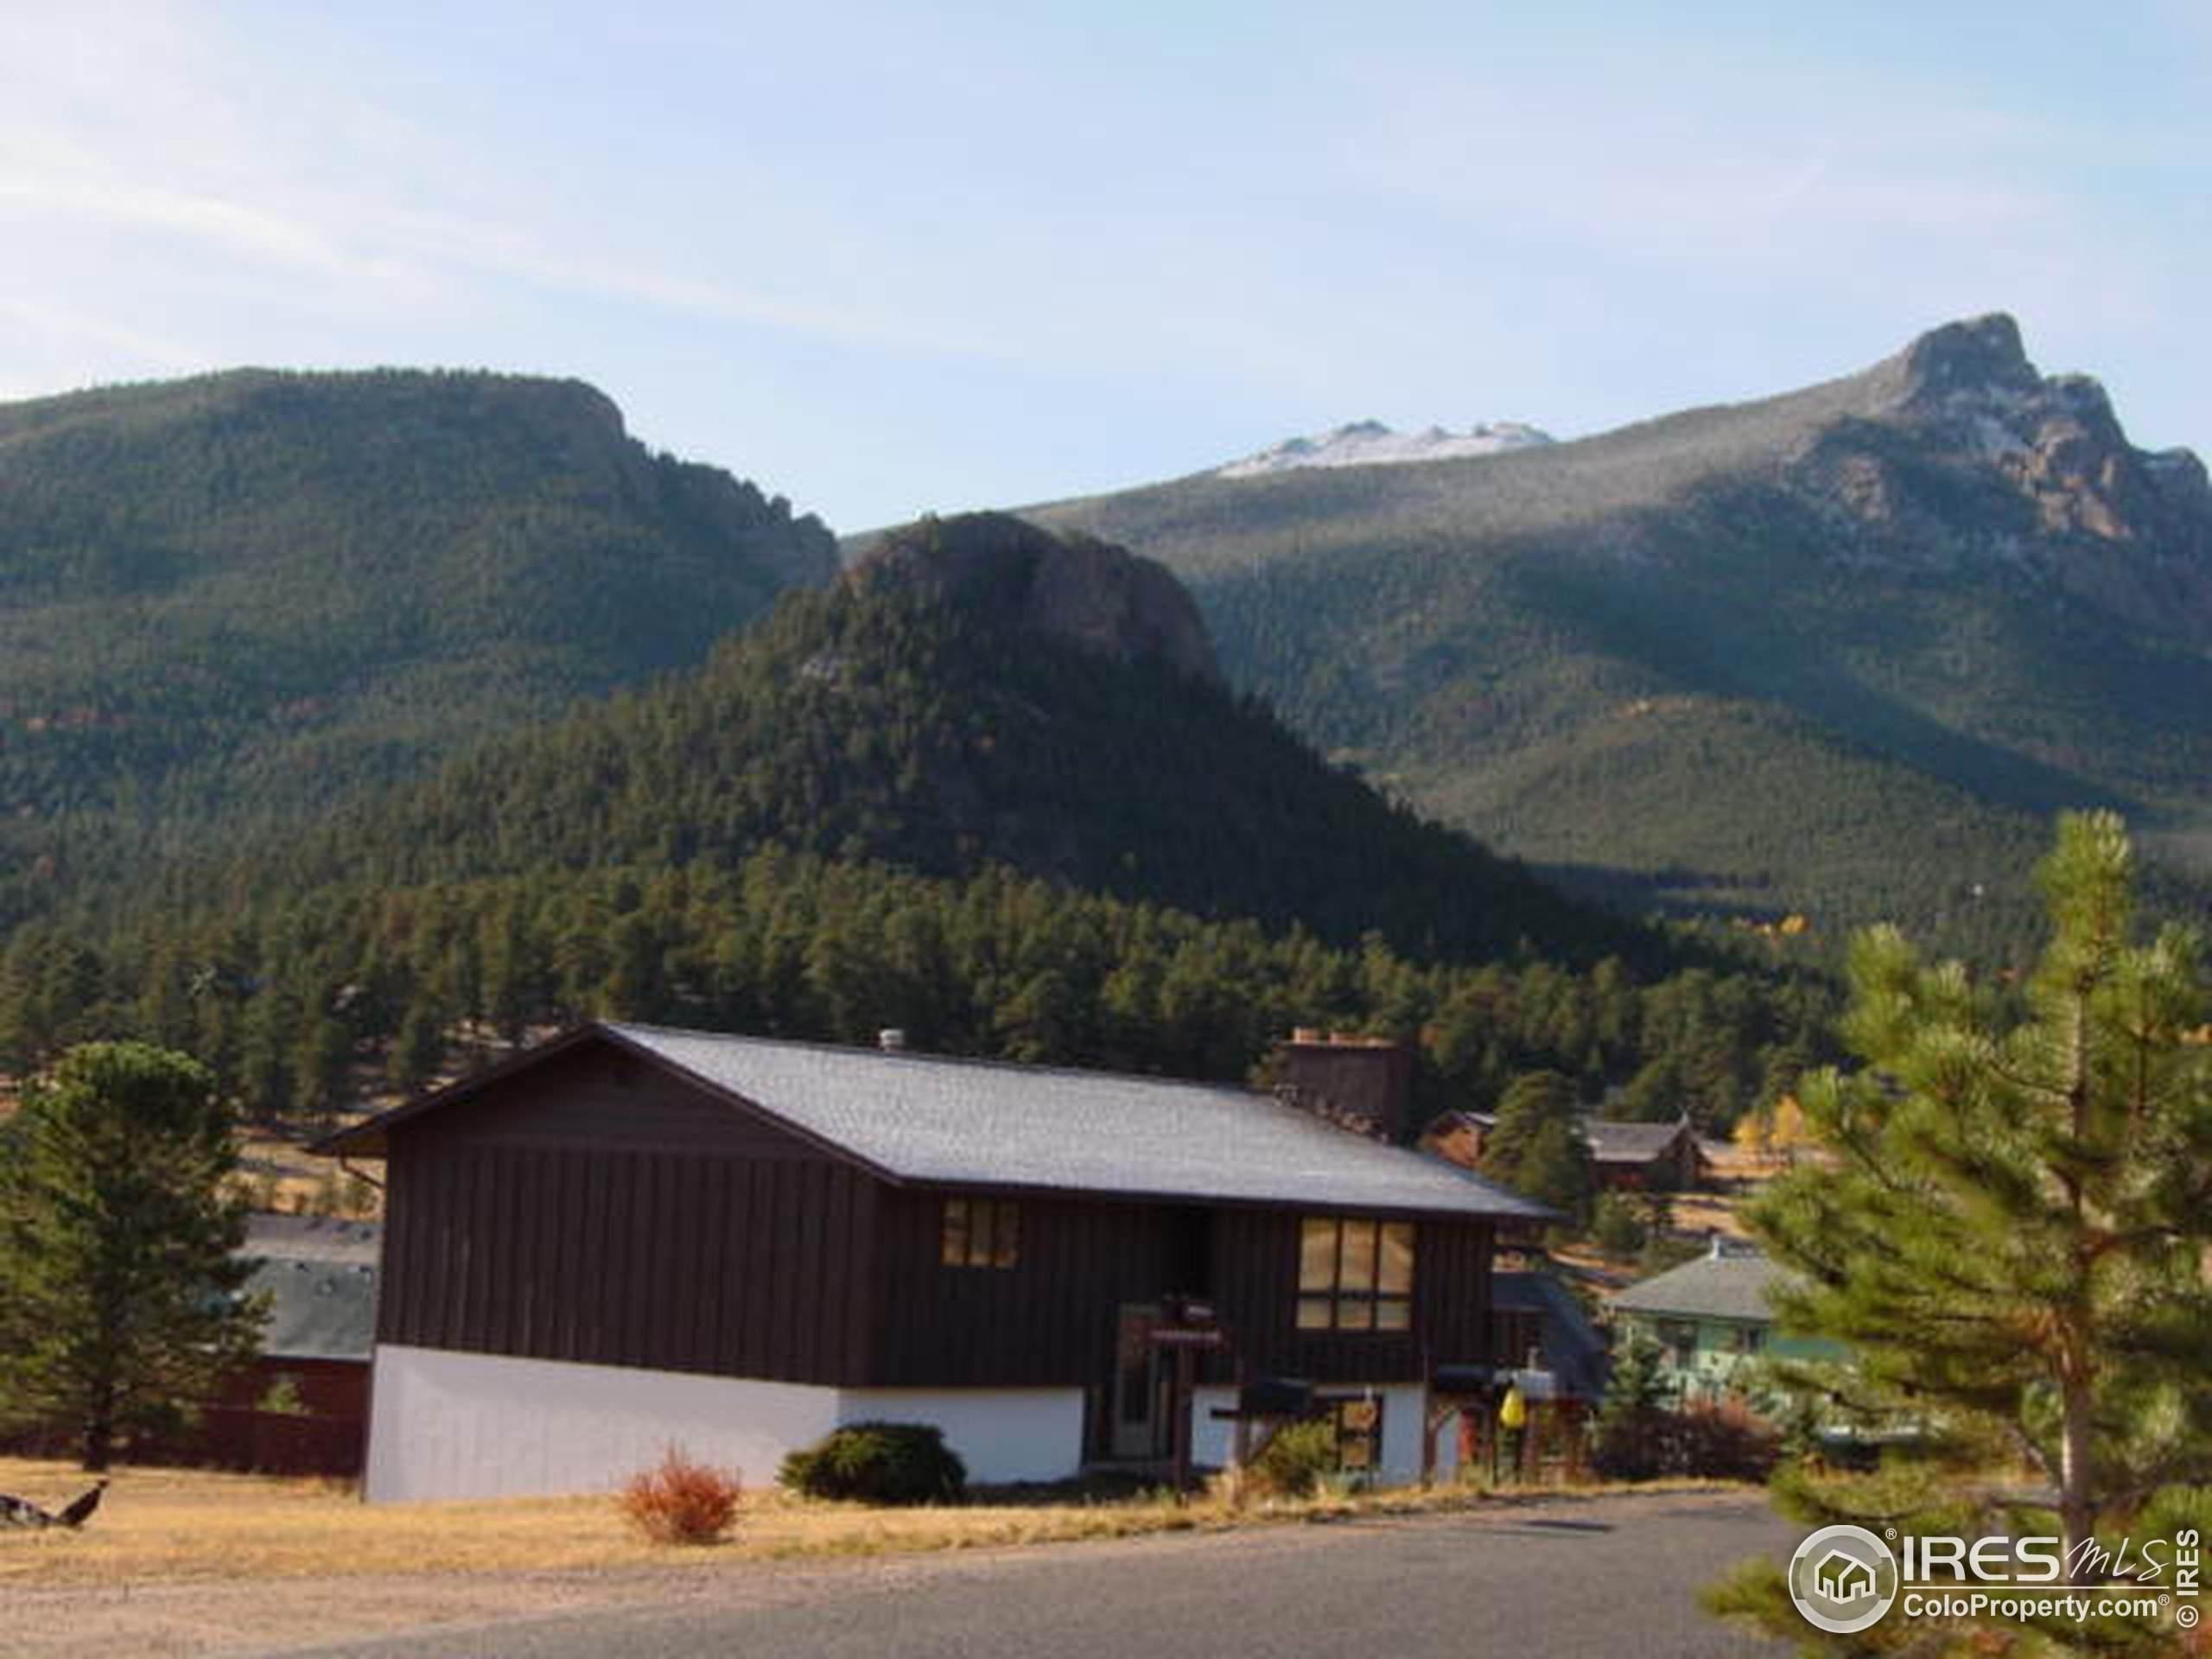 517 15th St, Boulder, CO 80302 (MLS #941792) :: RE/MAX Alliance